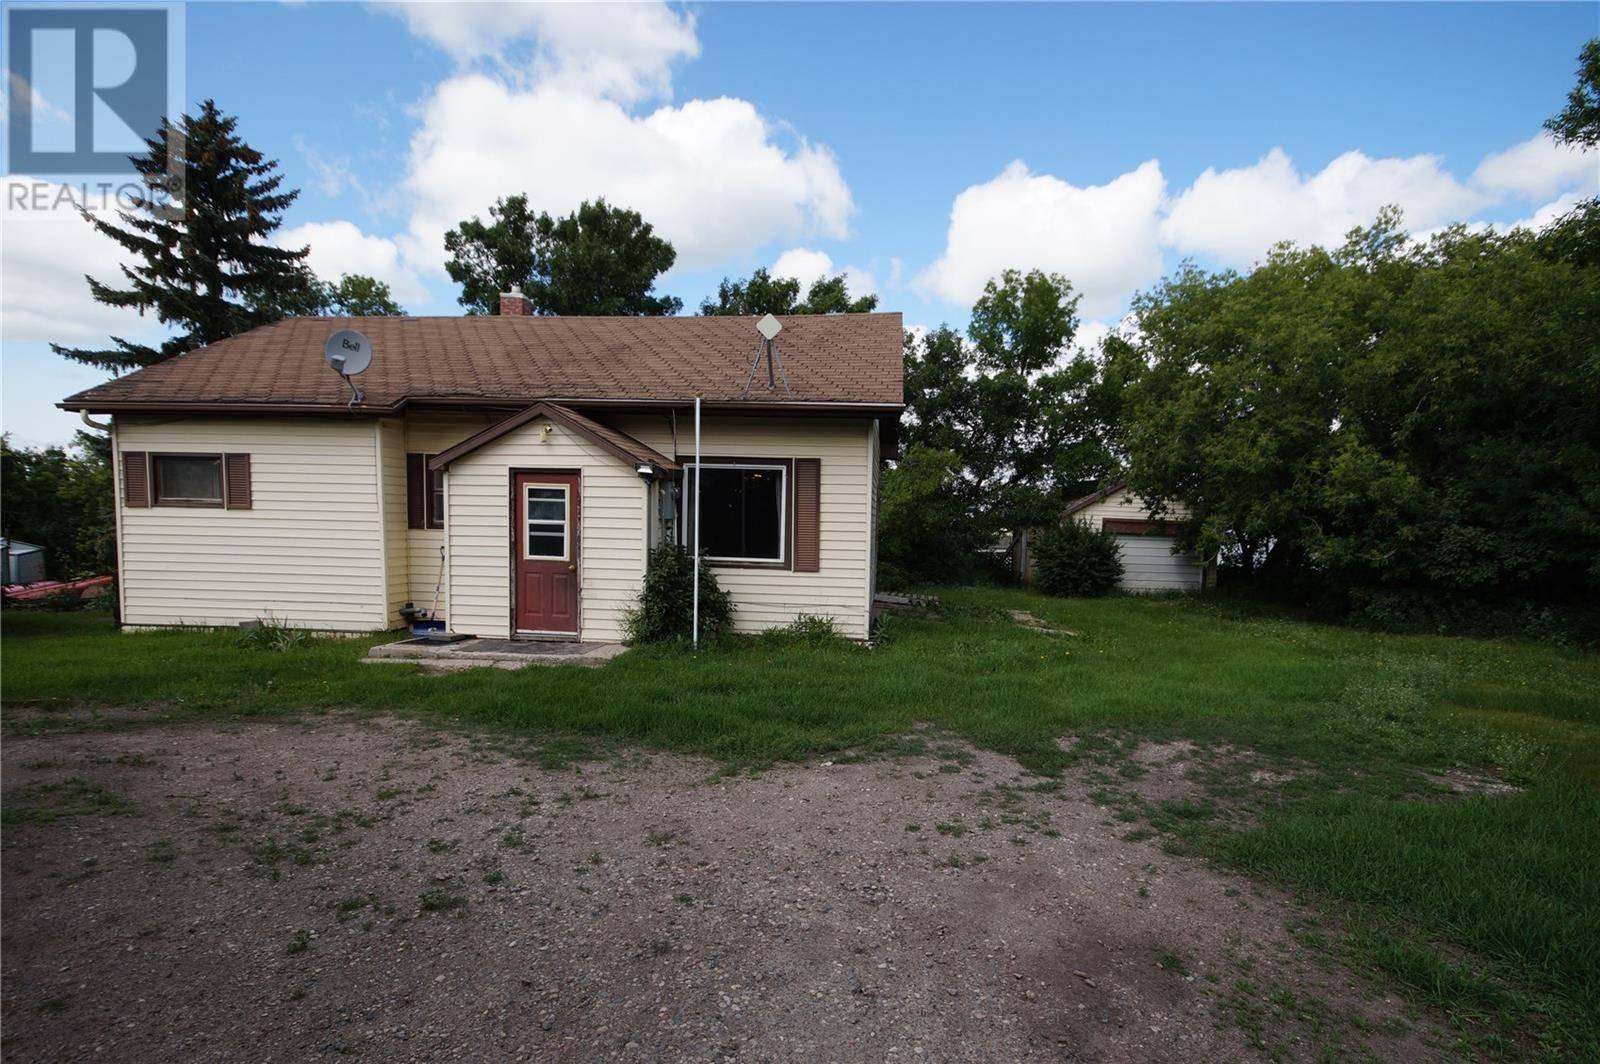 House for sale at 404 3rd St N Waldheim Saskatchewan - MLS: SK779568